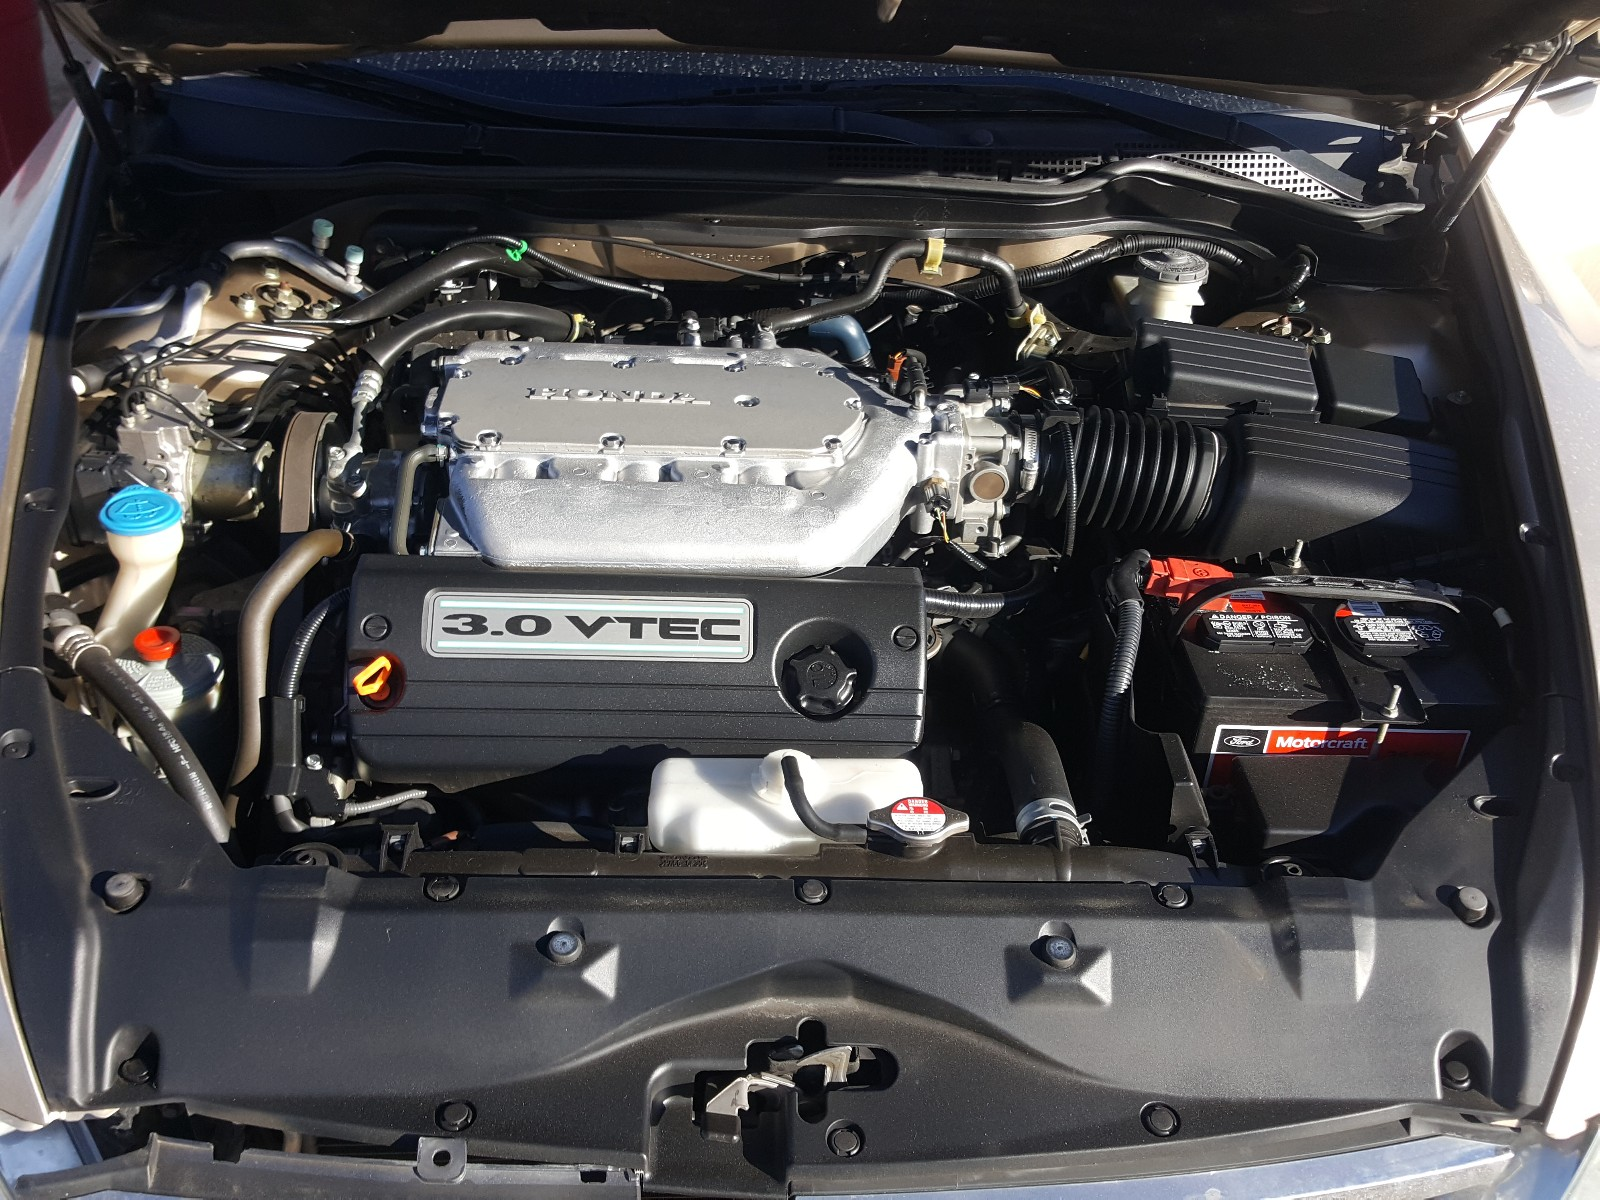 1HGCM66537A007991 - 2007 Honda Accord Ex 3.0L inside view